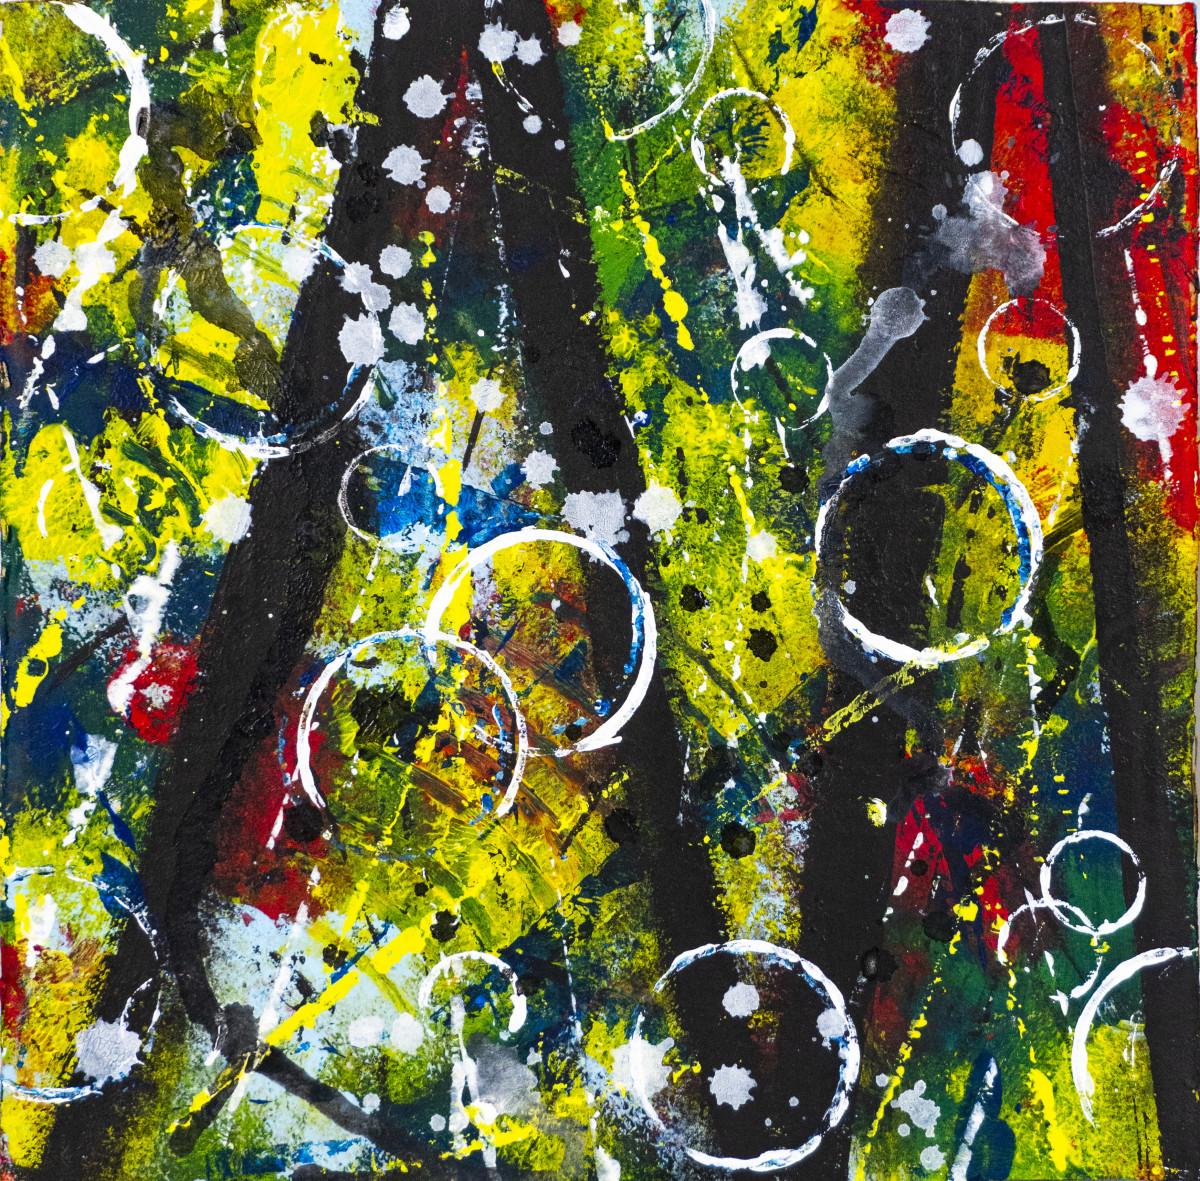 JAMAICAN HUE by Audrey Beharie-McGee